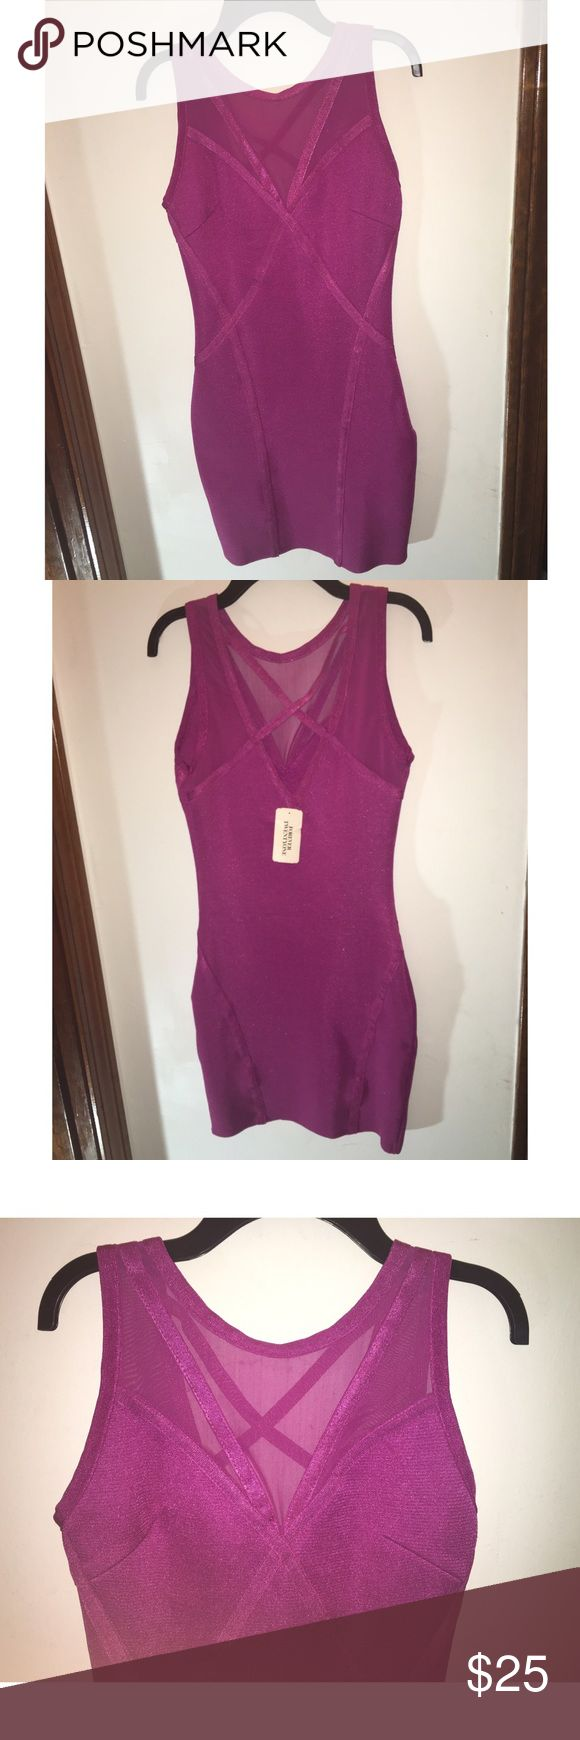 Light purple bandage dress! The perfect night out dress. Never worn.      Size: S Dresses Mini